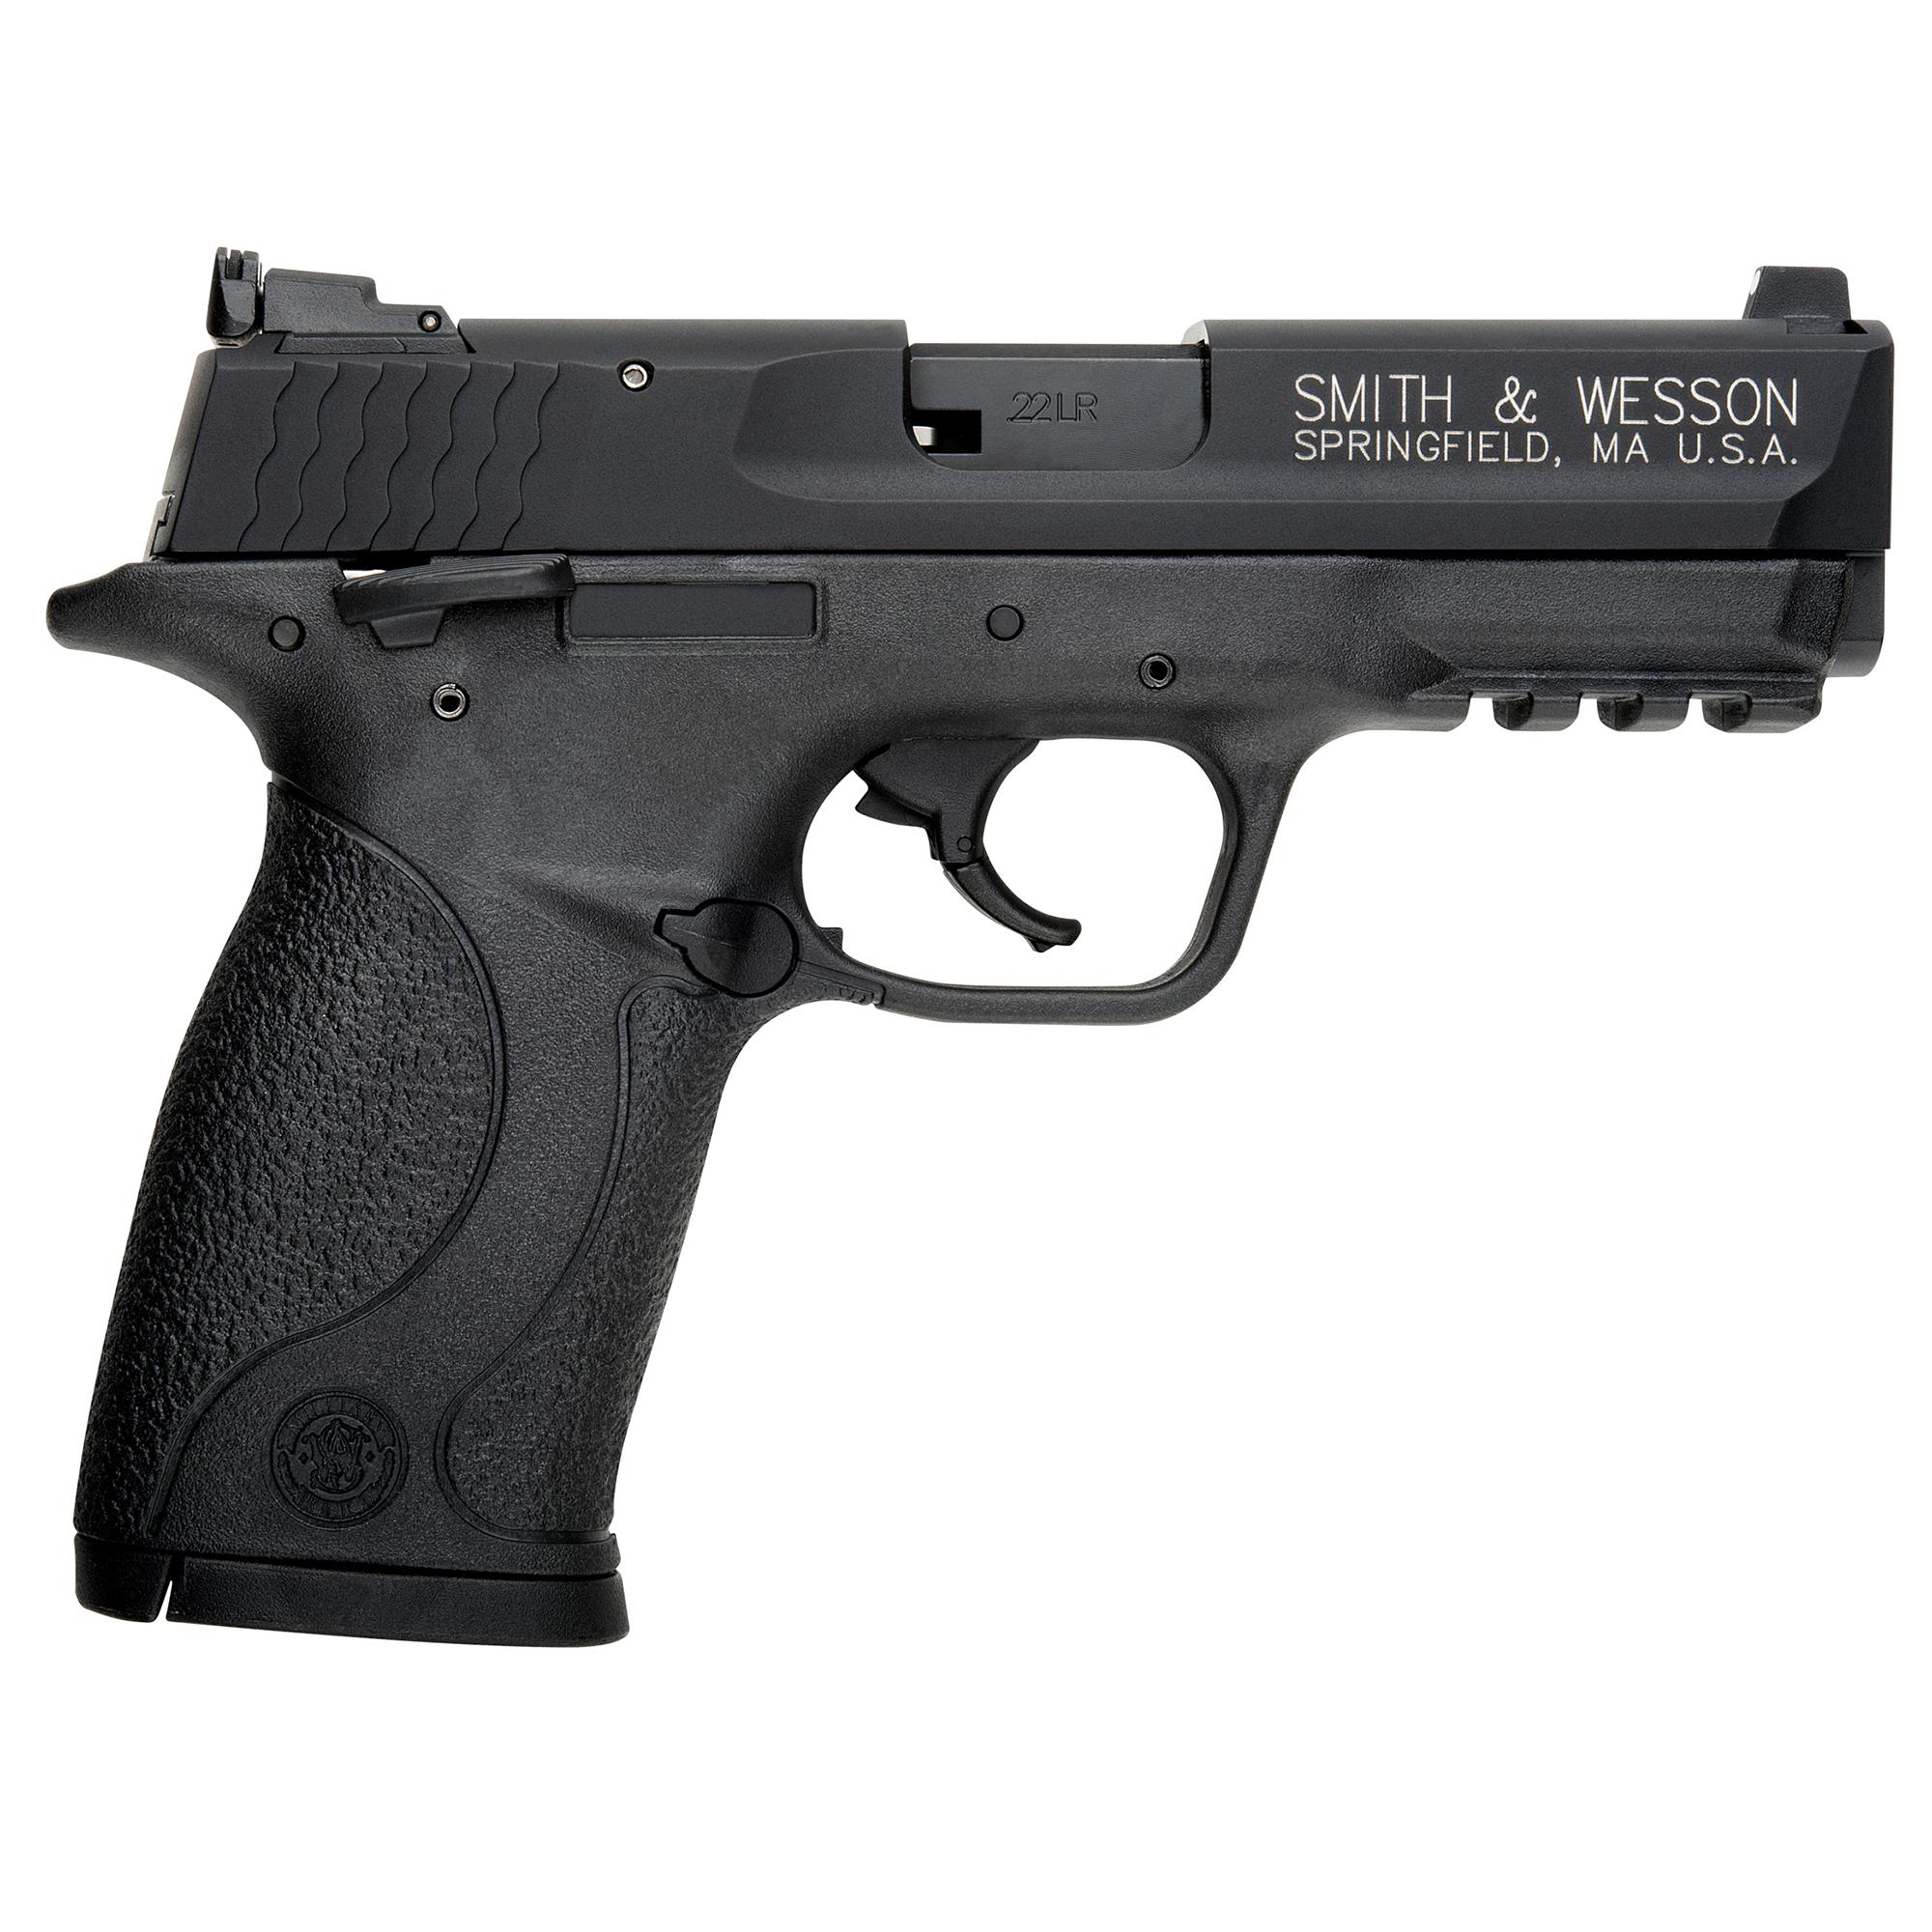 Smith & Wesson M & P22 Compact Handgun thumbnail